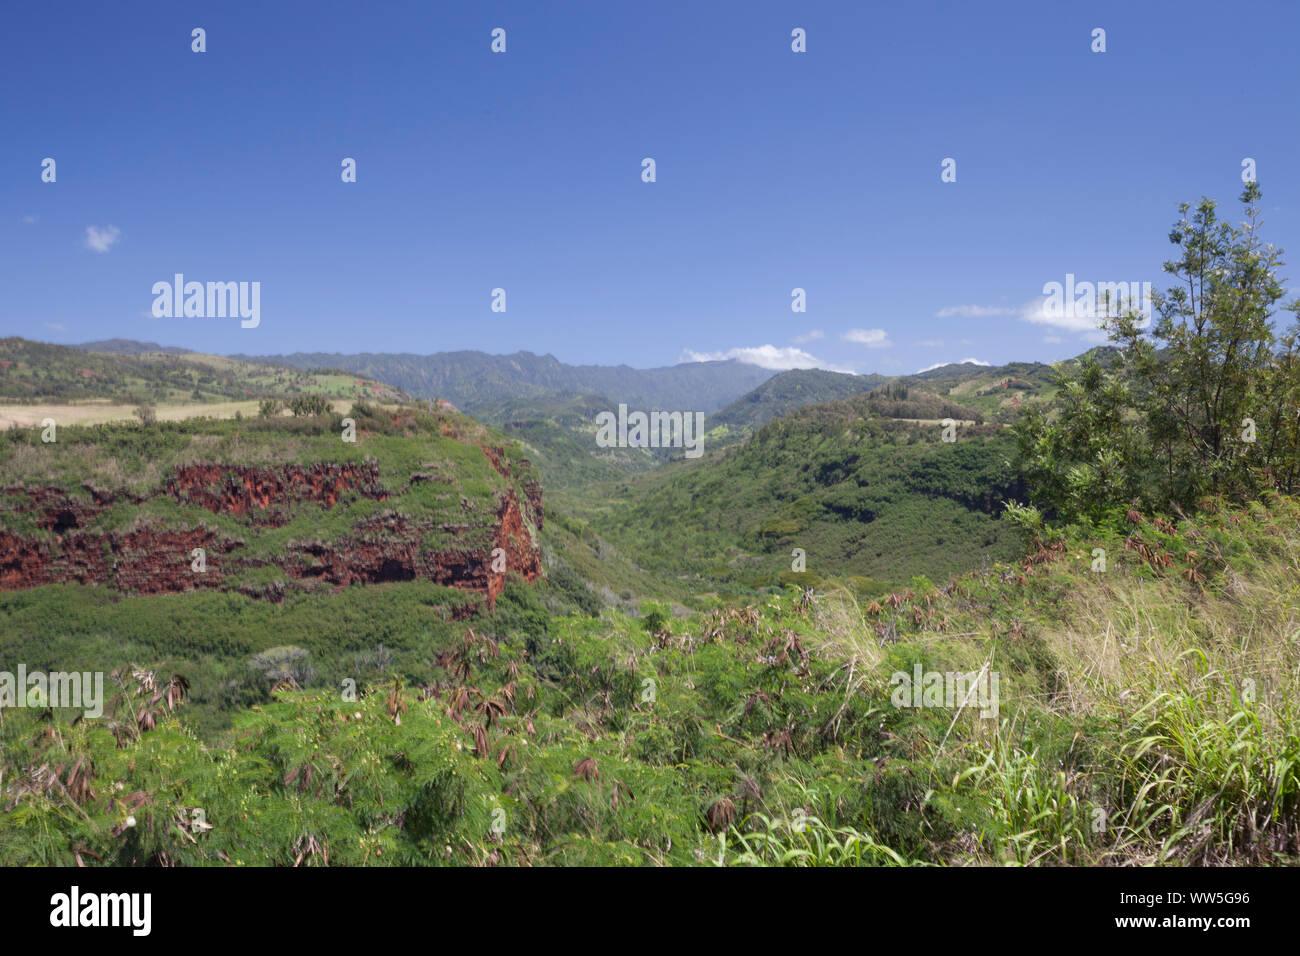 Mountain landscape in the inland, Kauai, Hawaii, USA Stock Photo